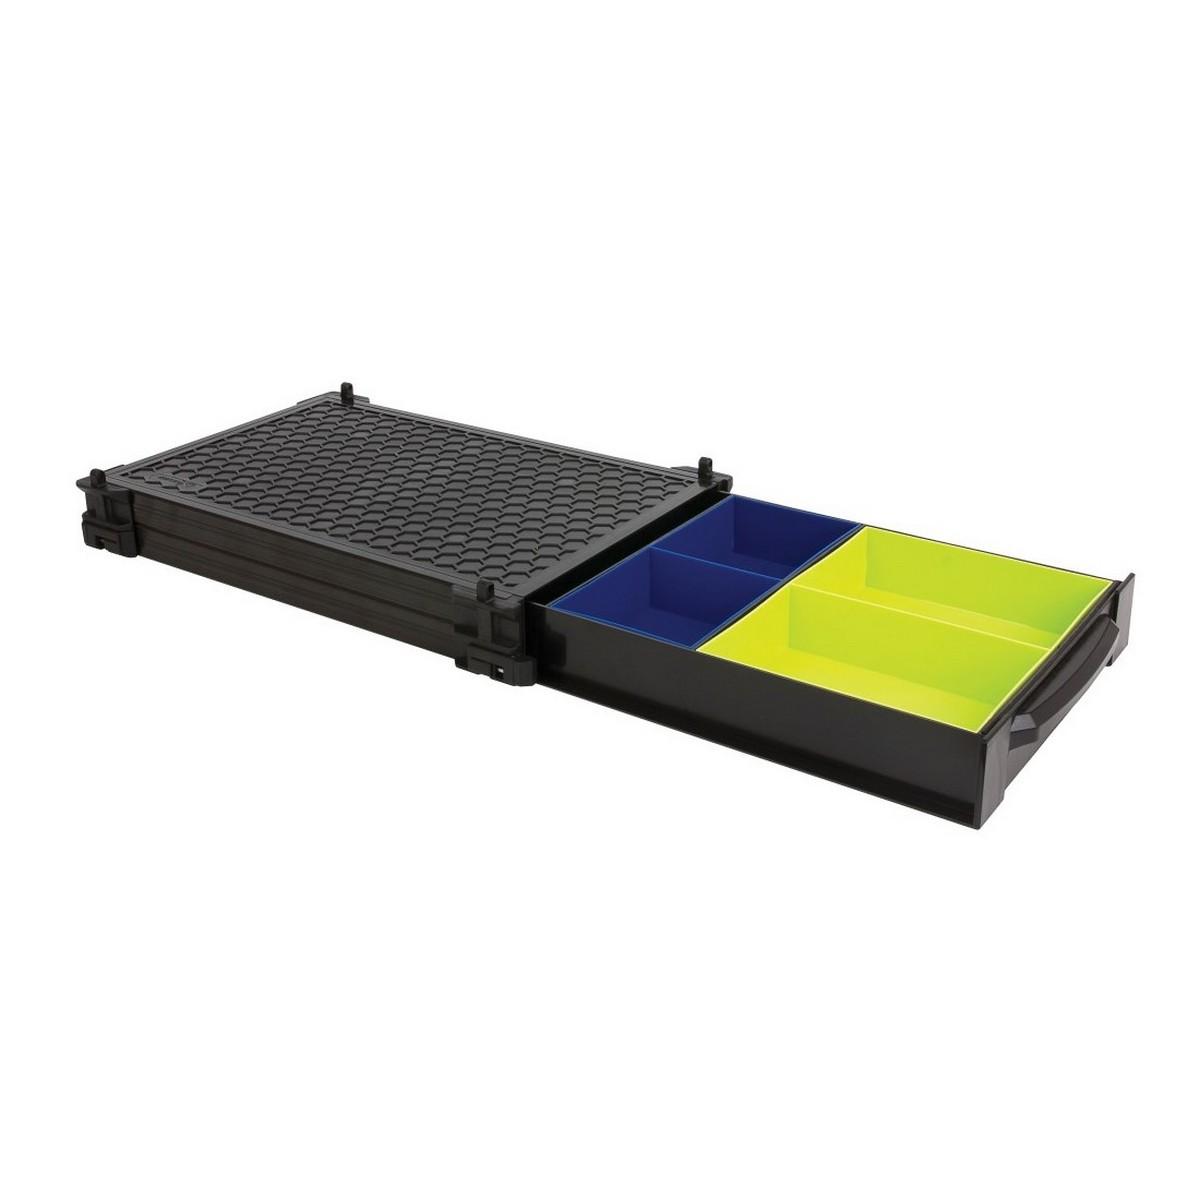 Matrix Deep Draw Unit With Inserts – дълбока тава за платформа с 2 тави